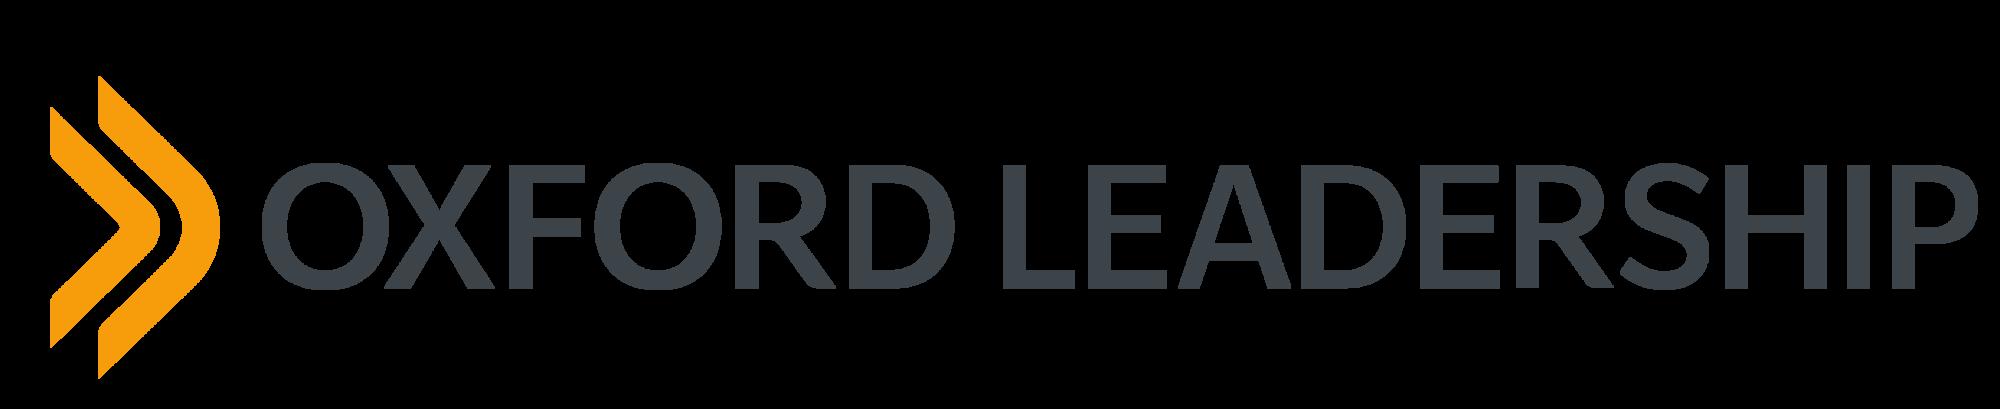 Oxford Leadership